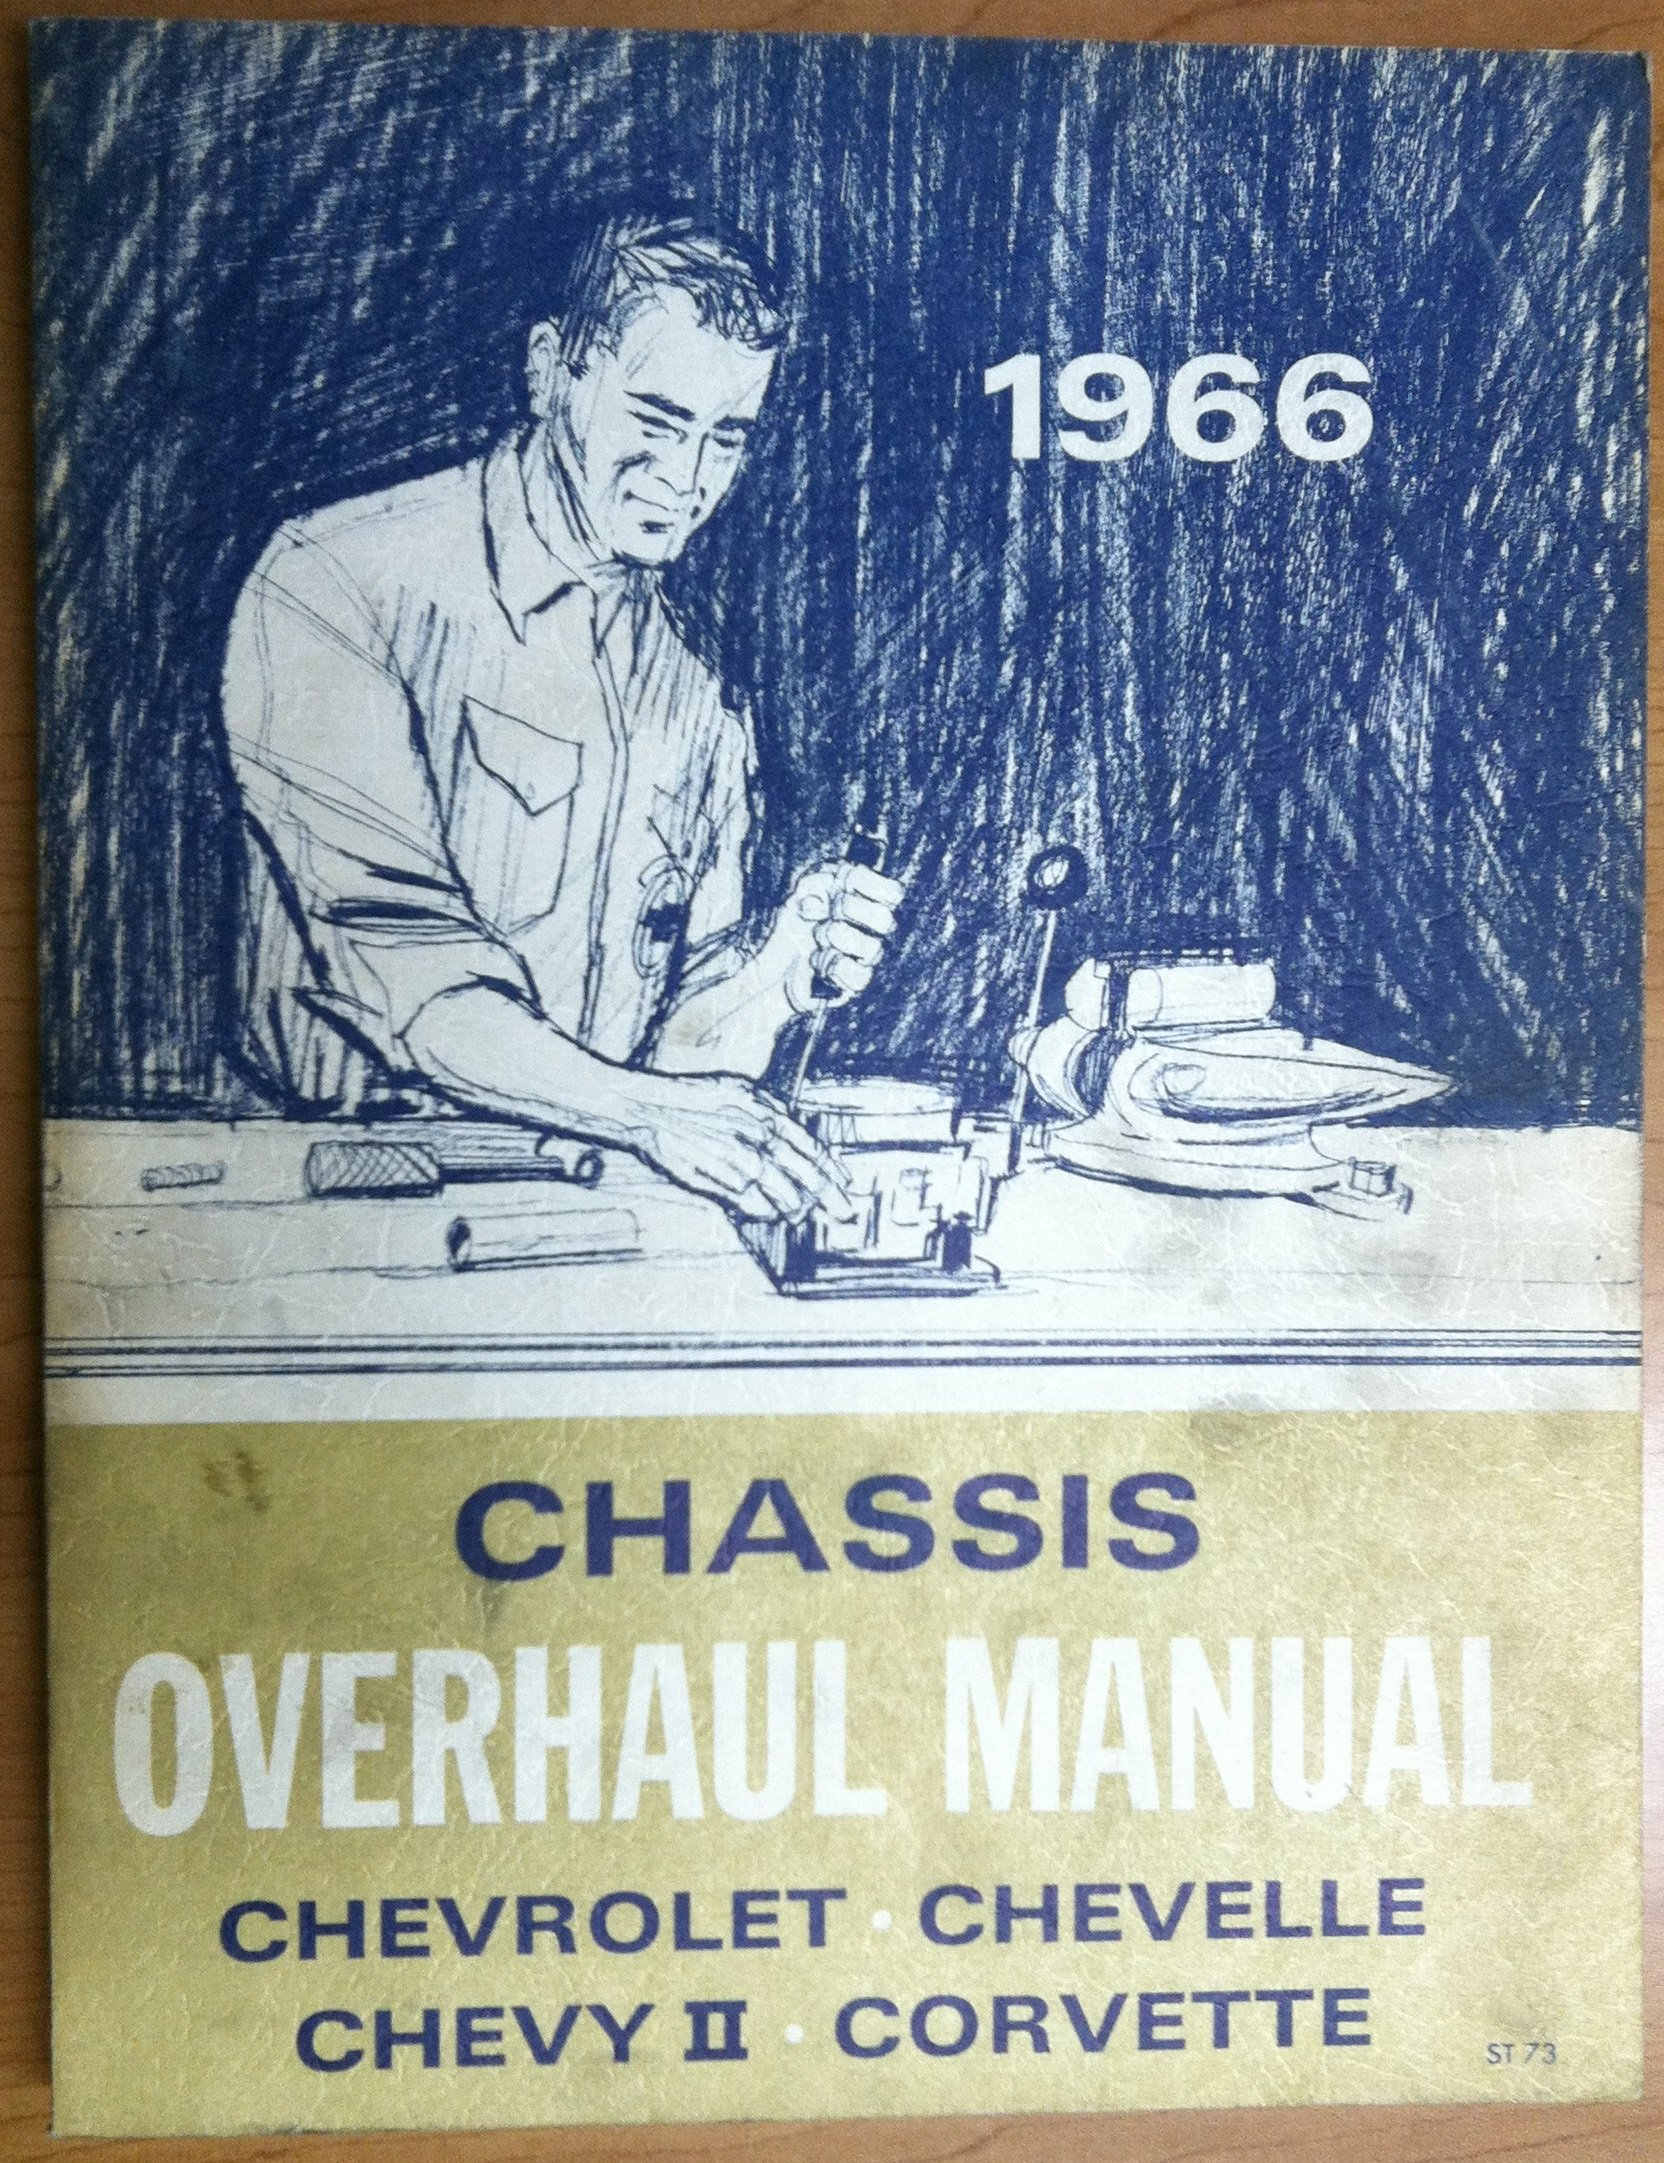 Chassis Overhaul Manual Chevrolet Chevelle Chevy II Corvette 1966:  Amazon.com: Books